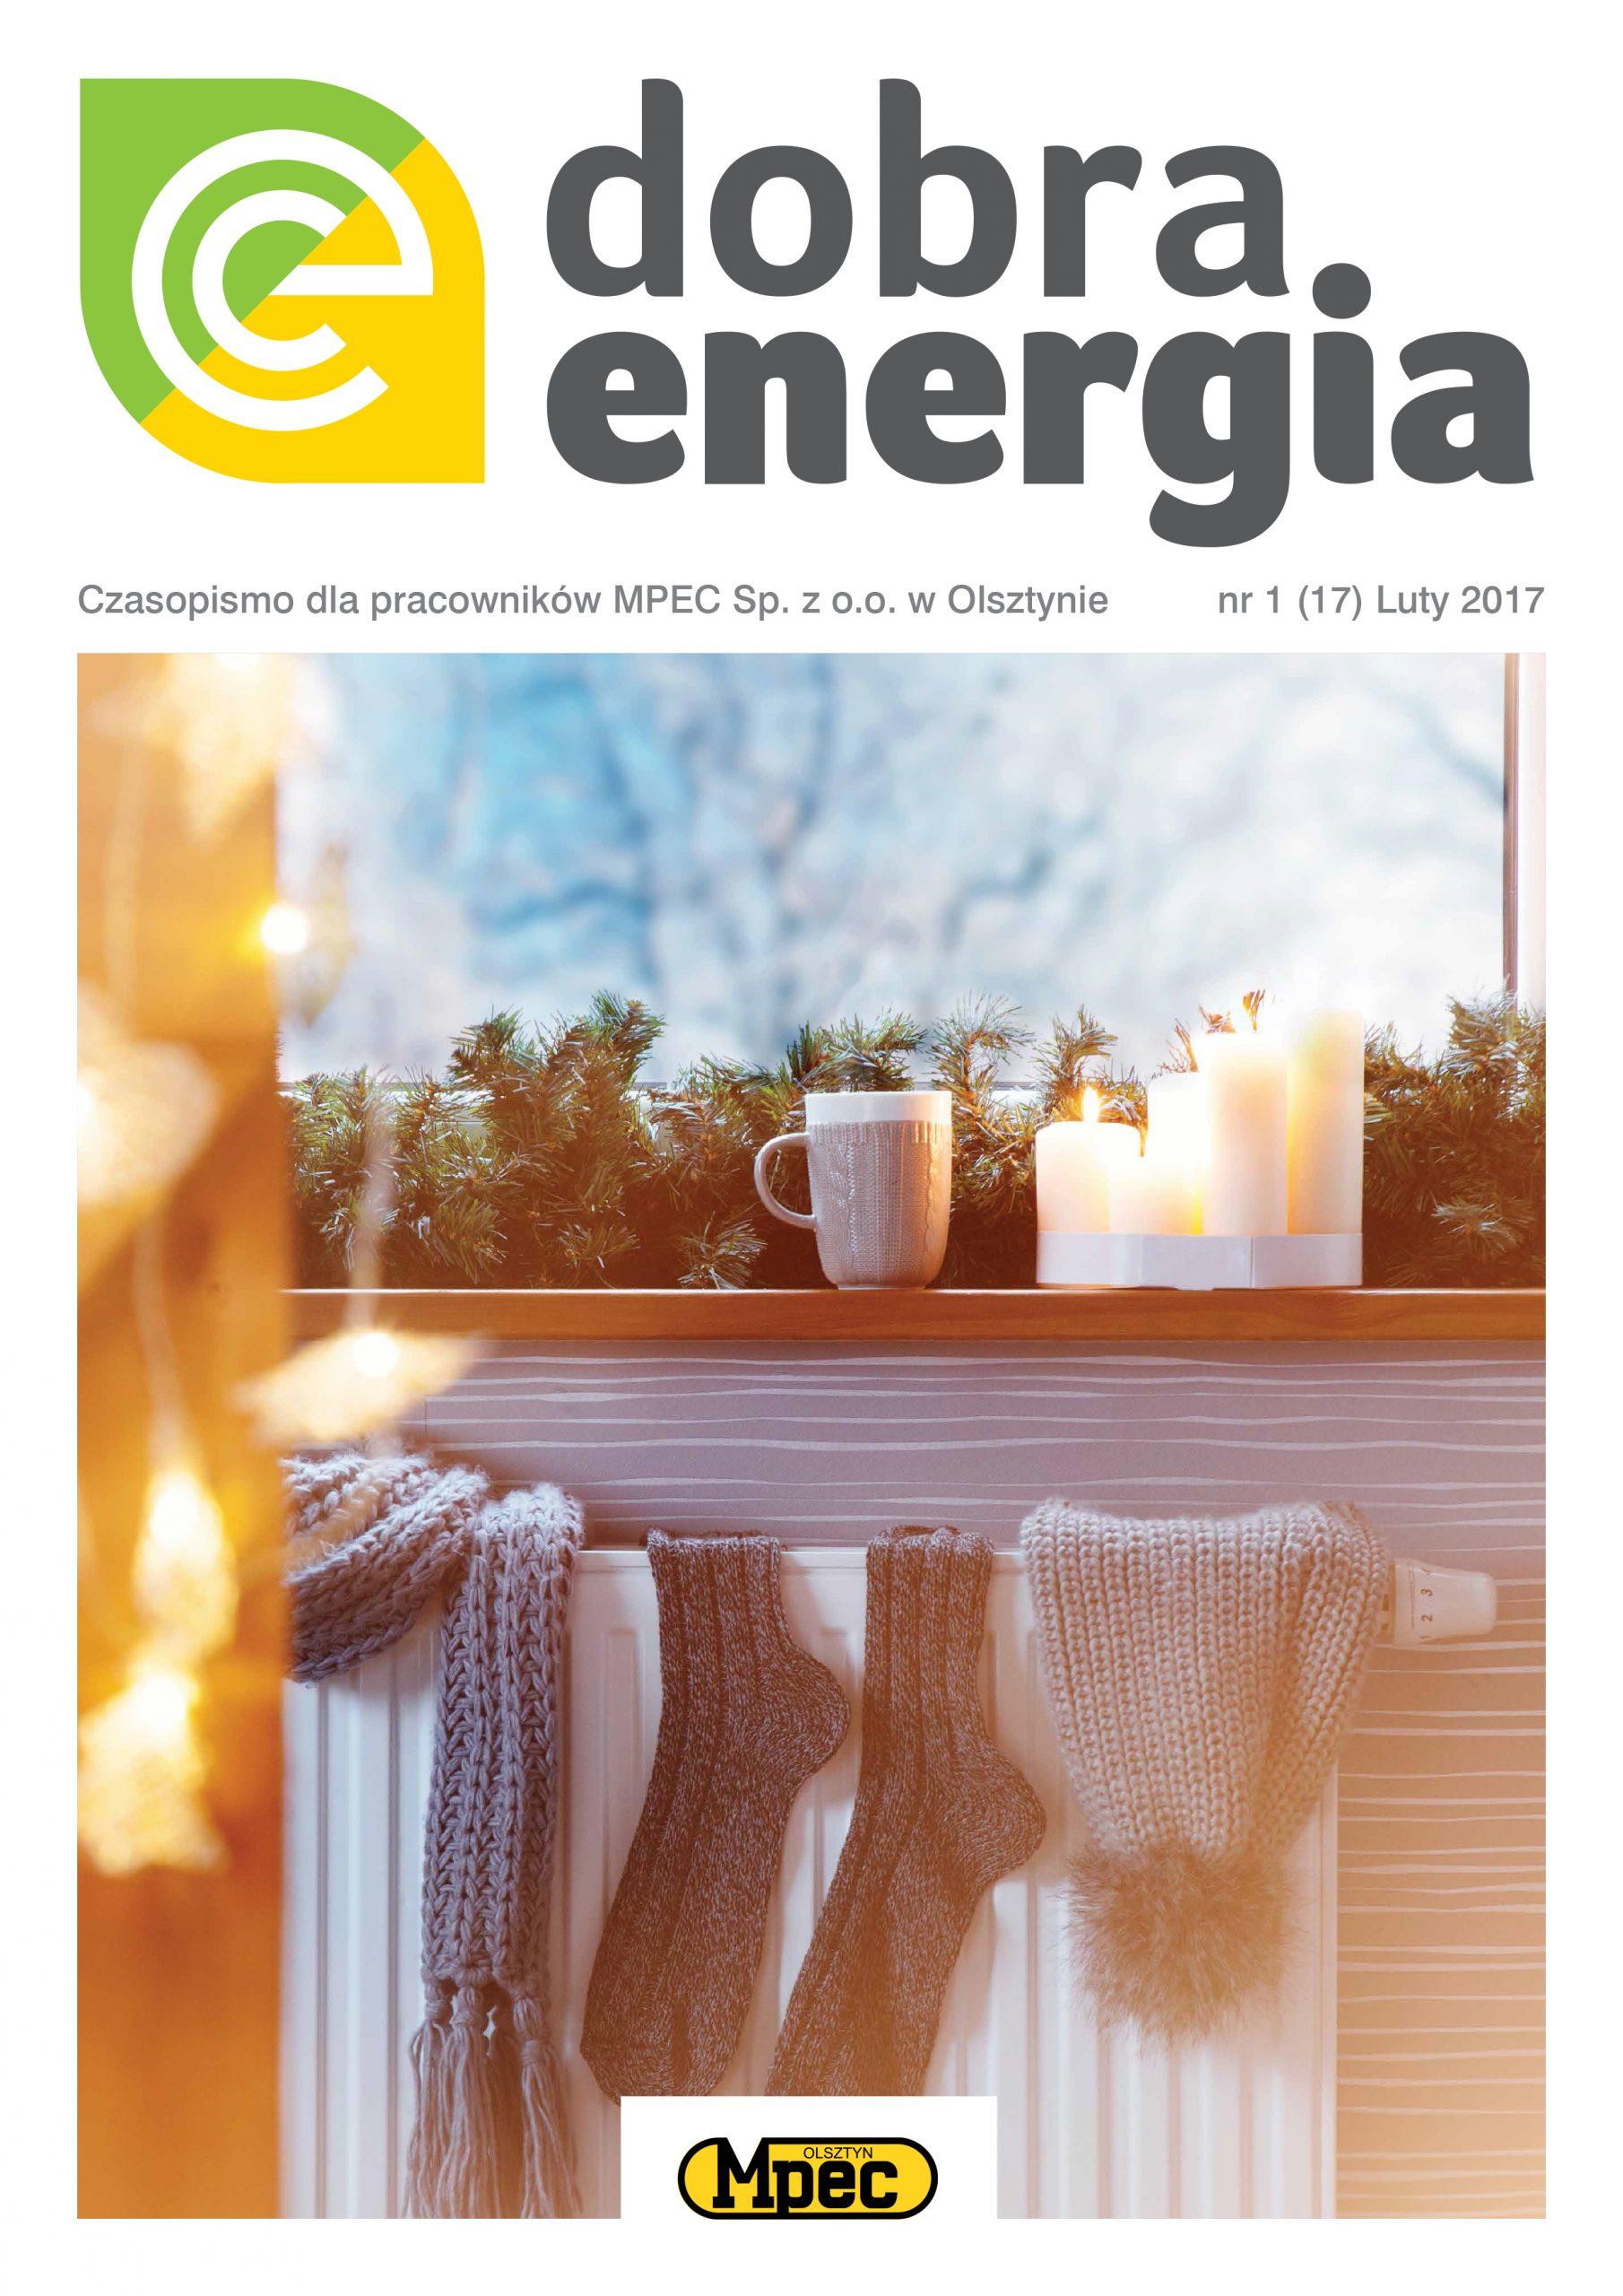 Dobra Energia MPEC